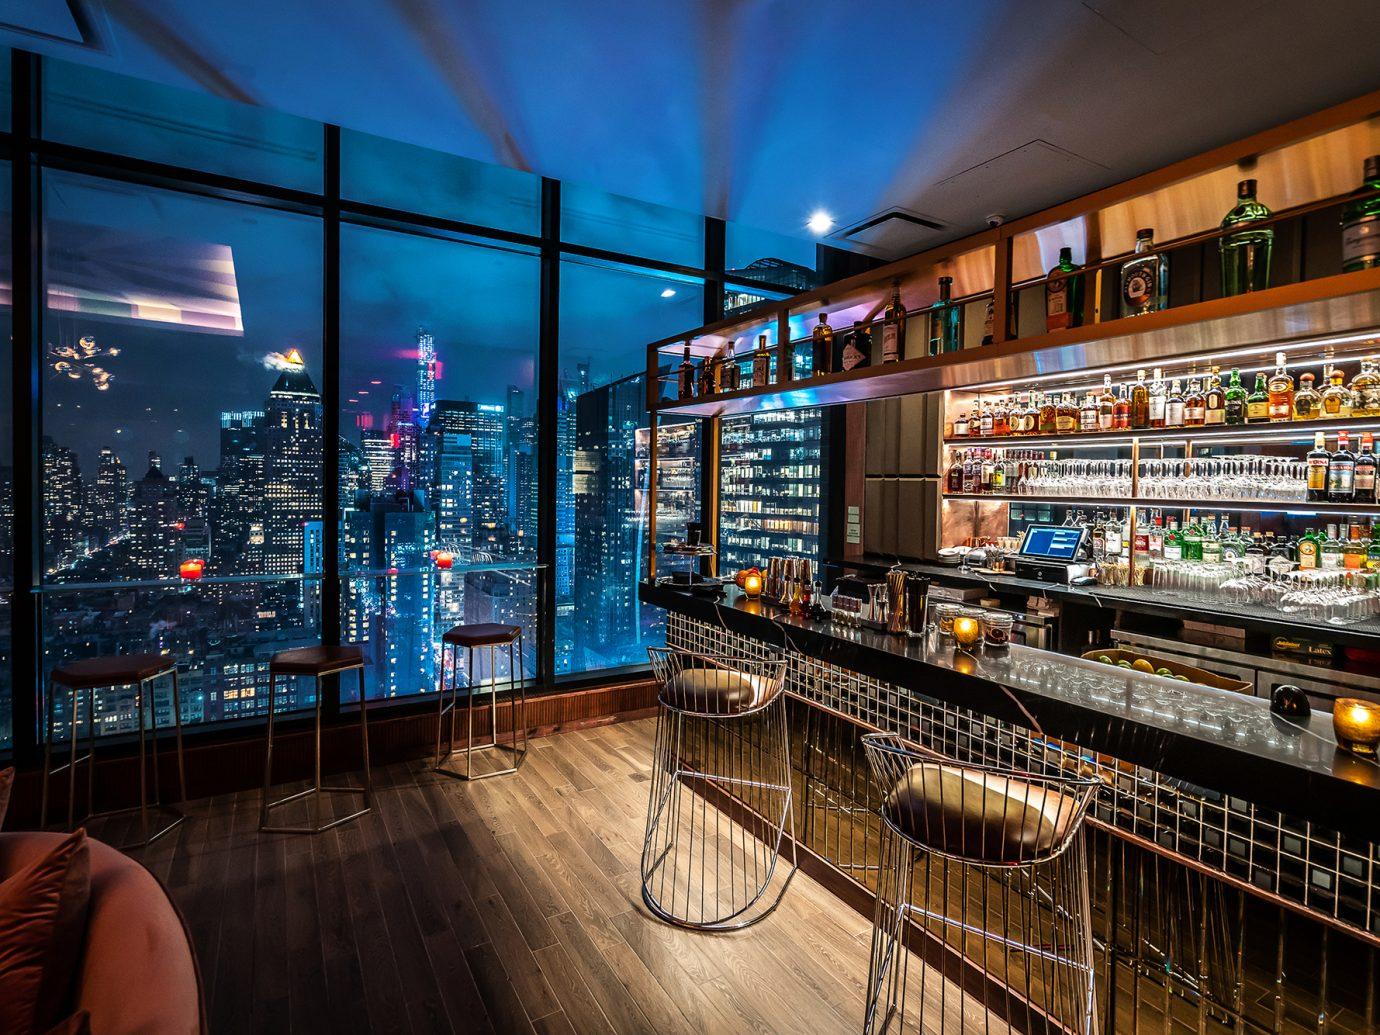 bar next to windows with NYC views